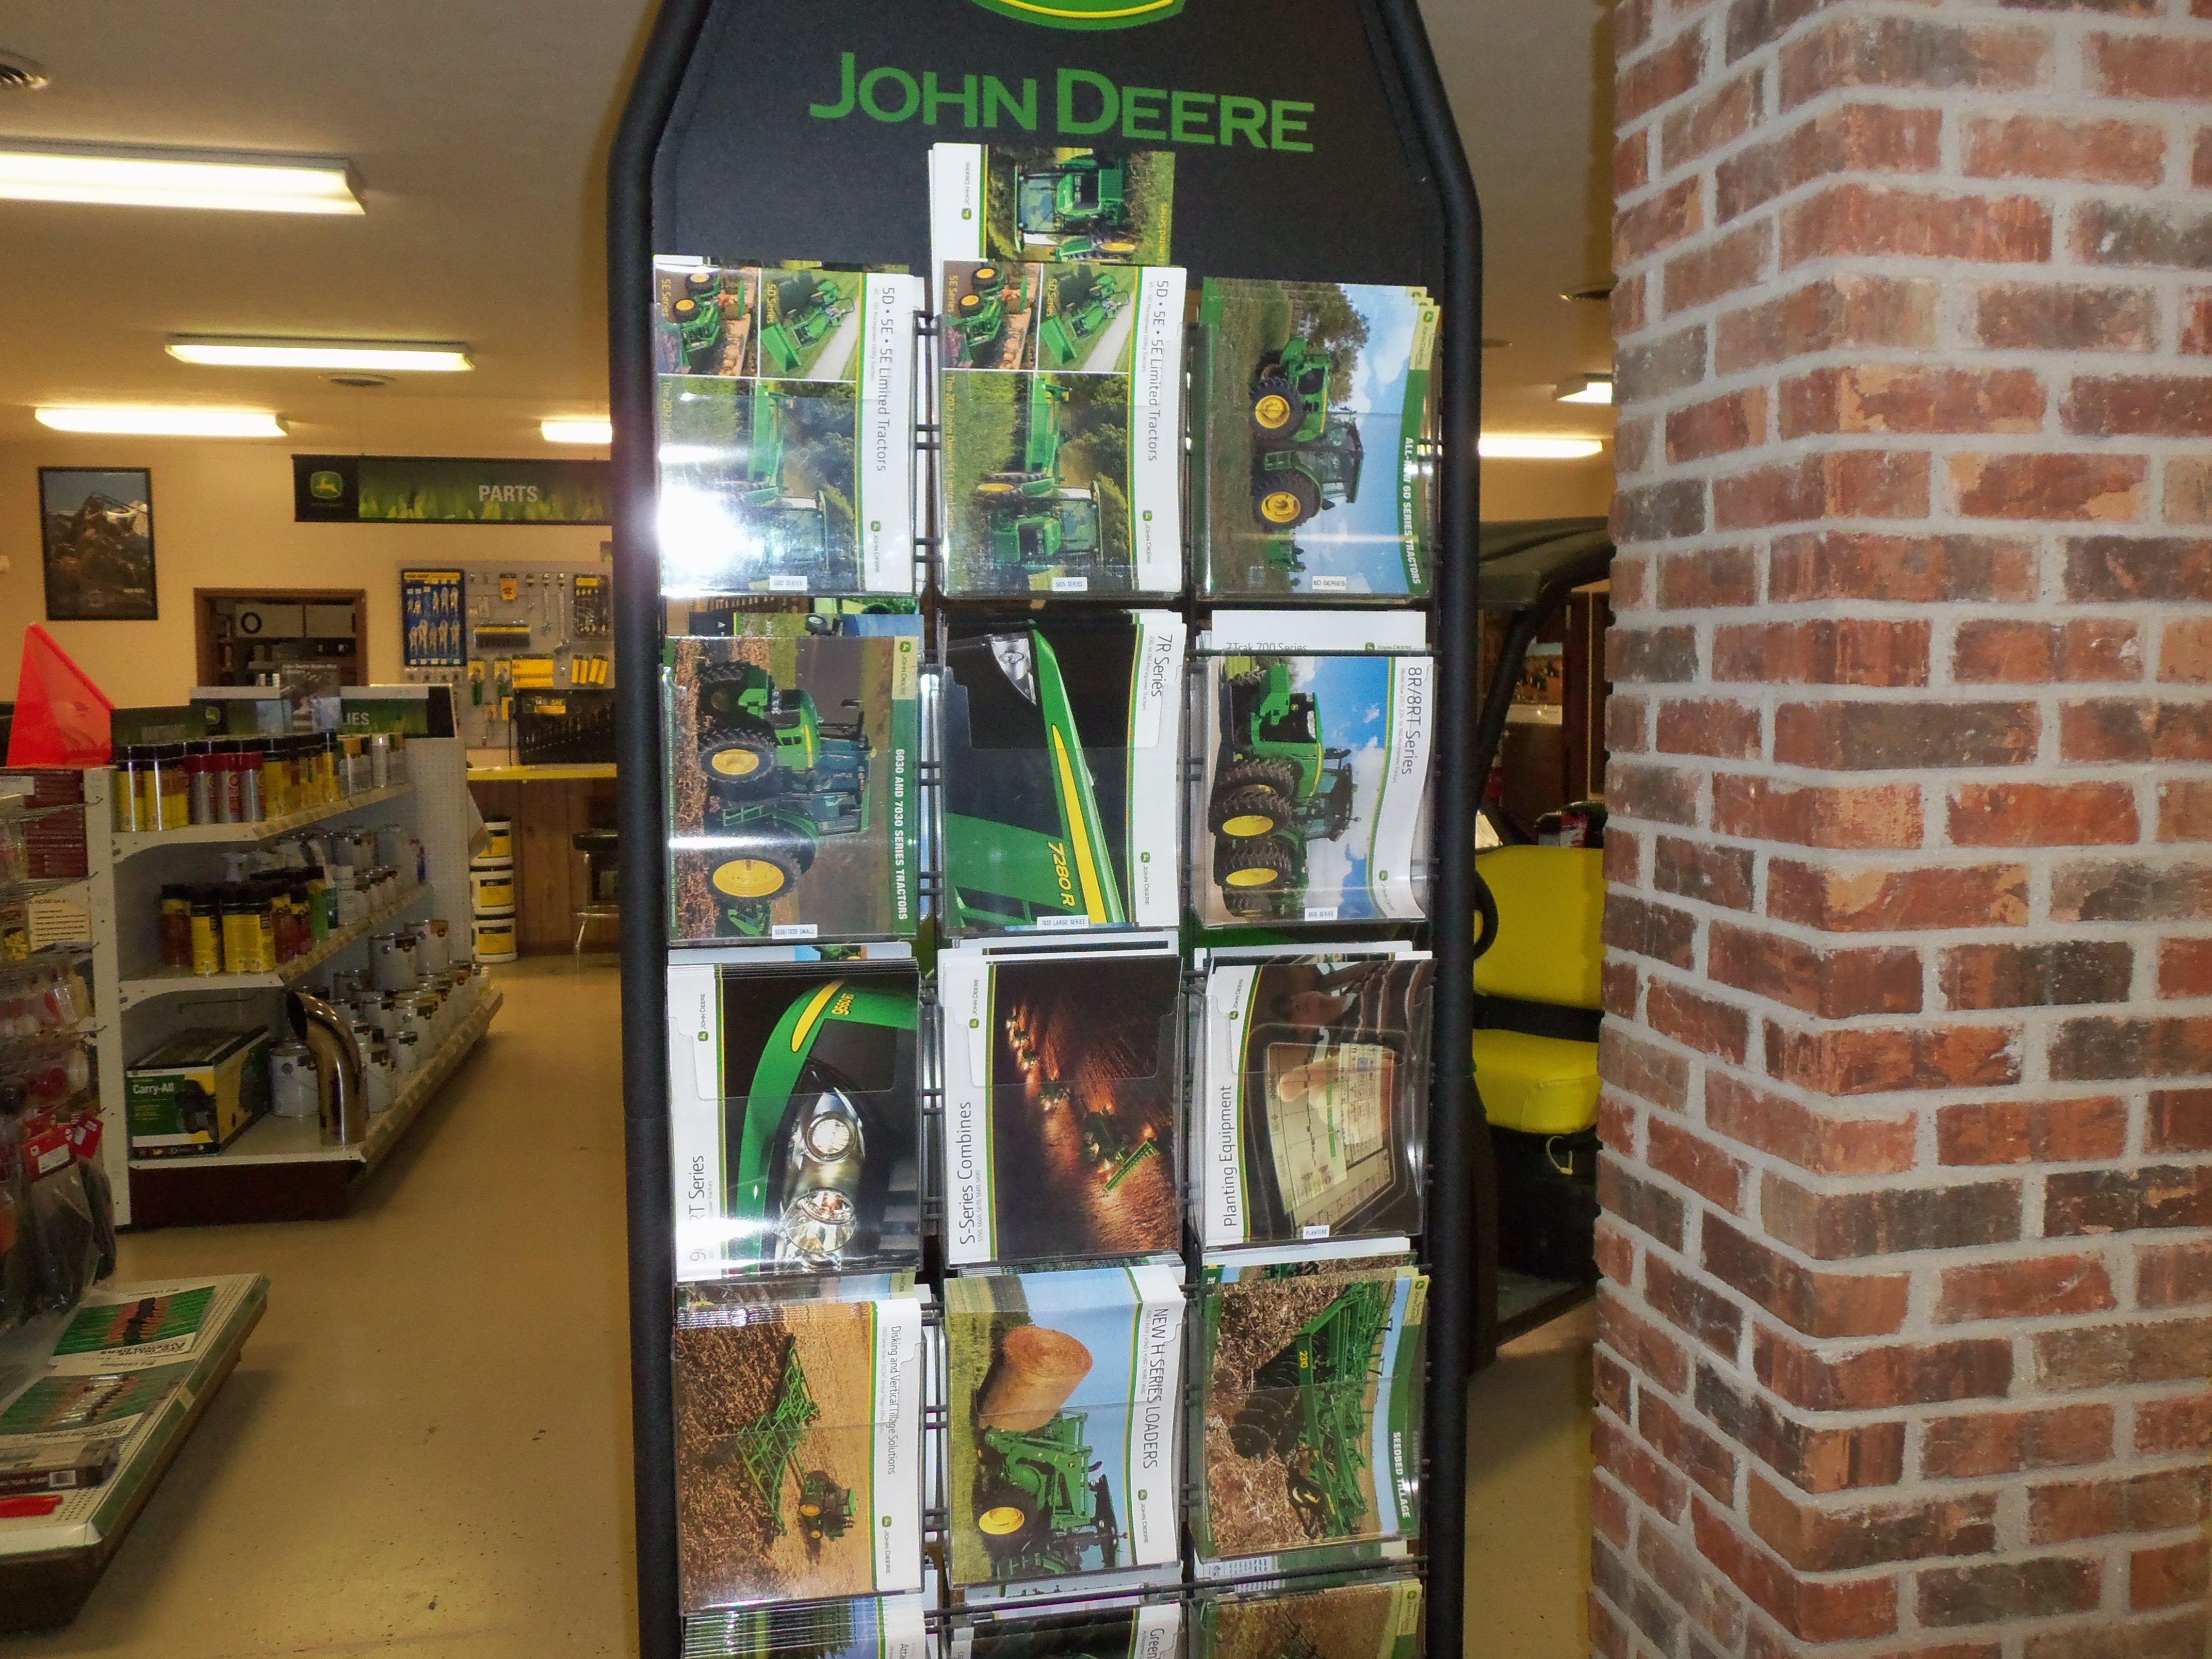 John deere kitchen decor - John Deere Kitchen Decor 53